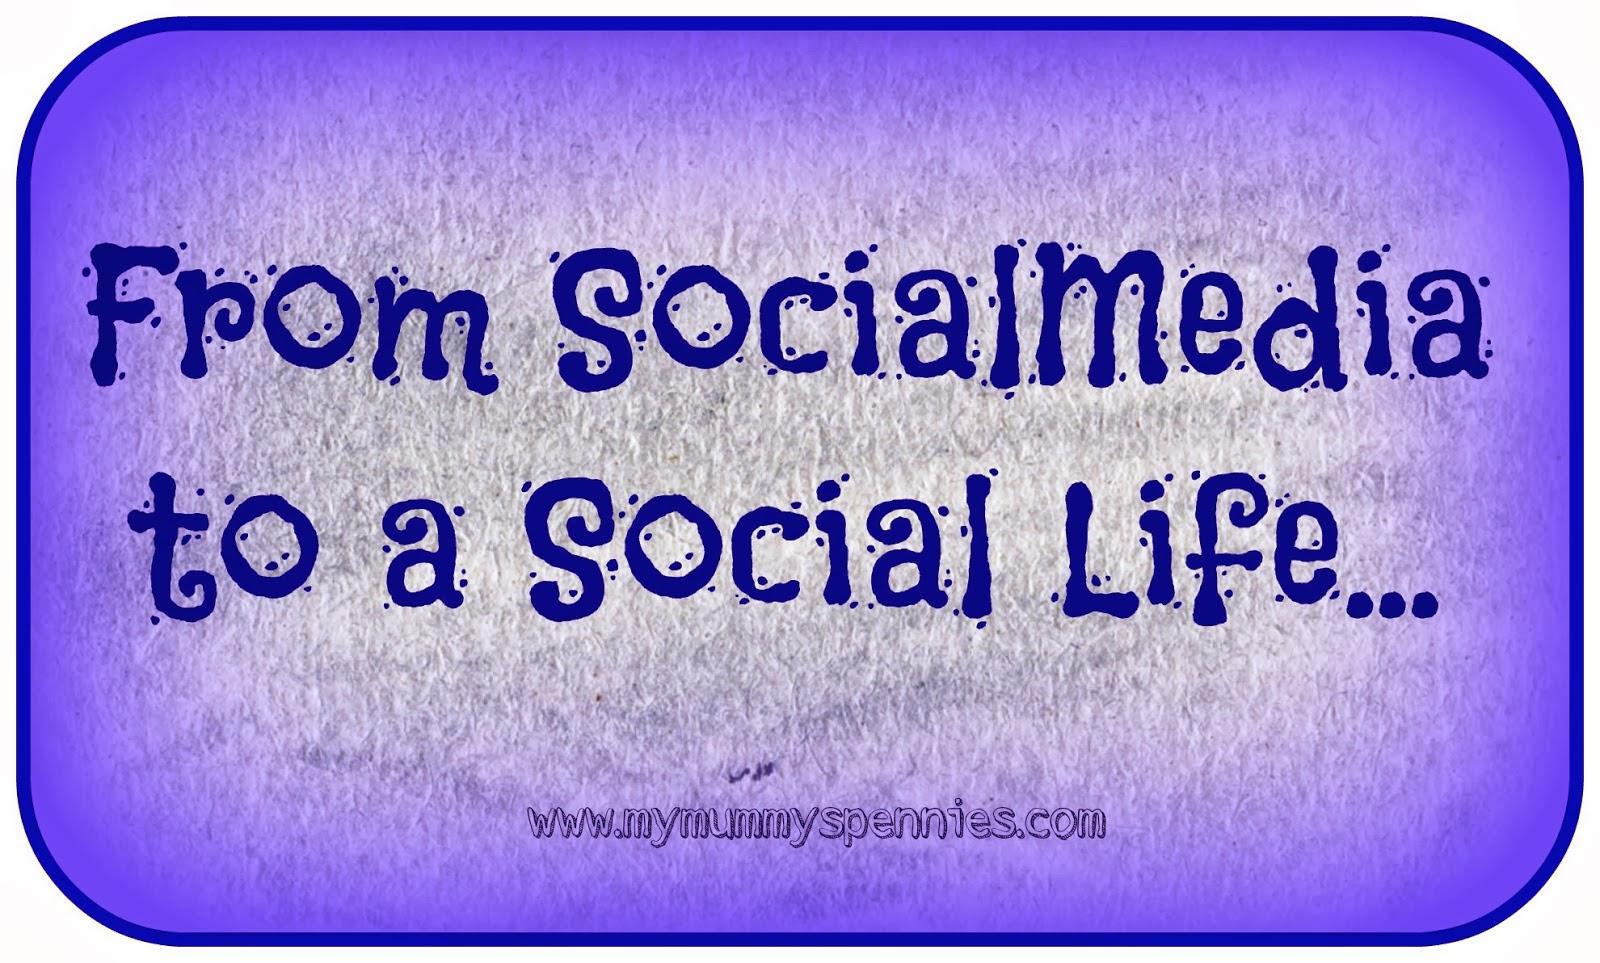 From social media to a social life